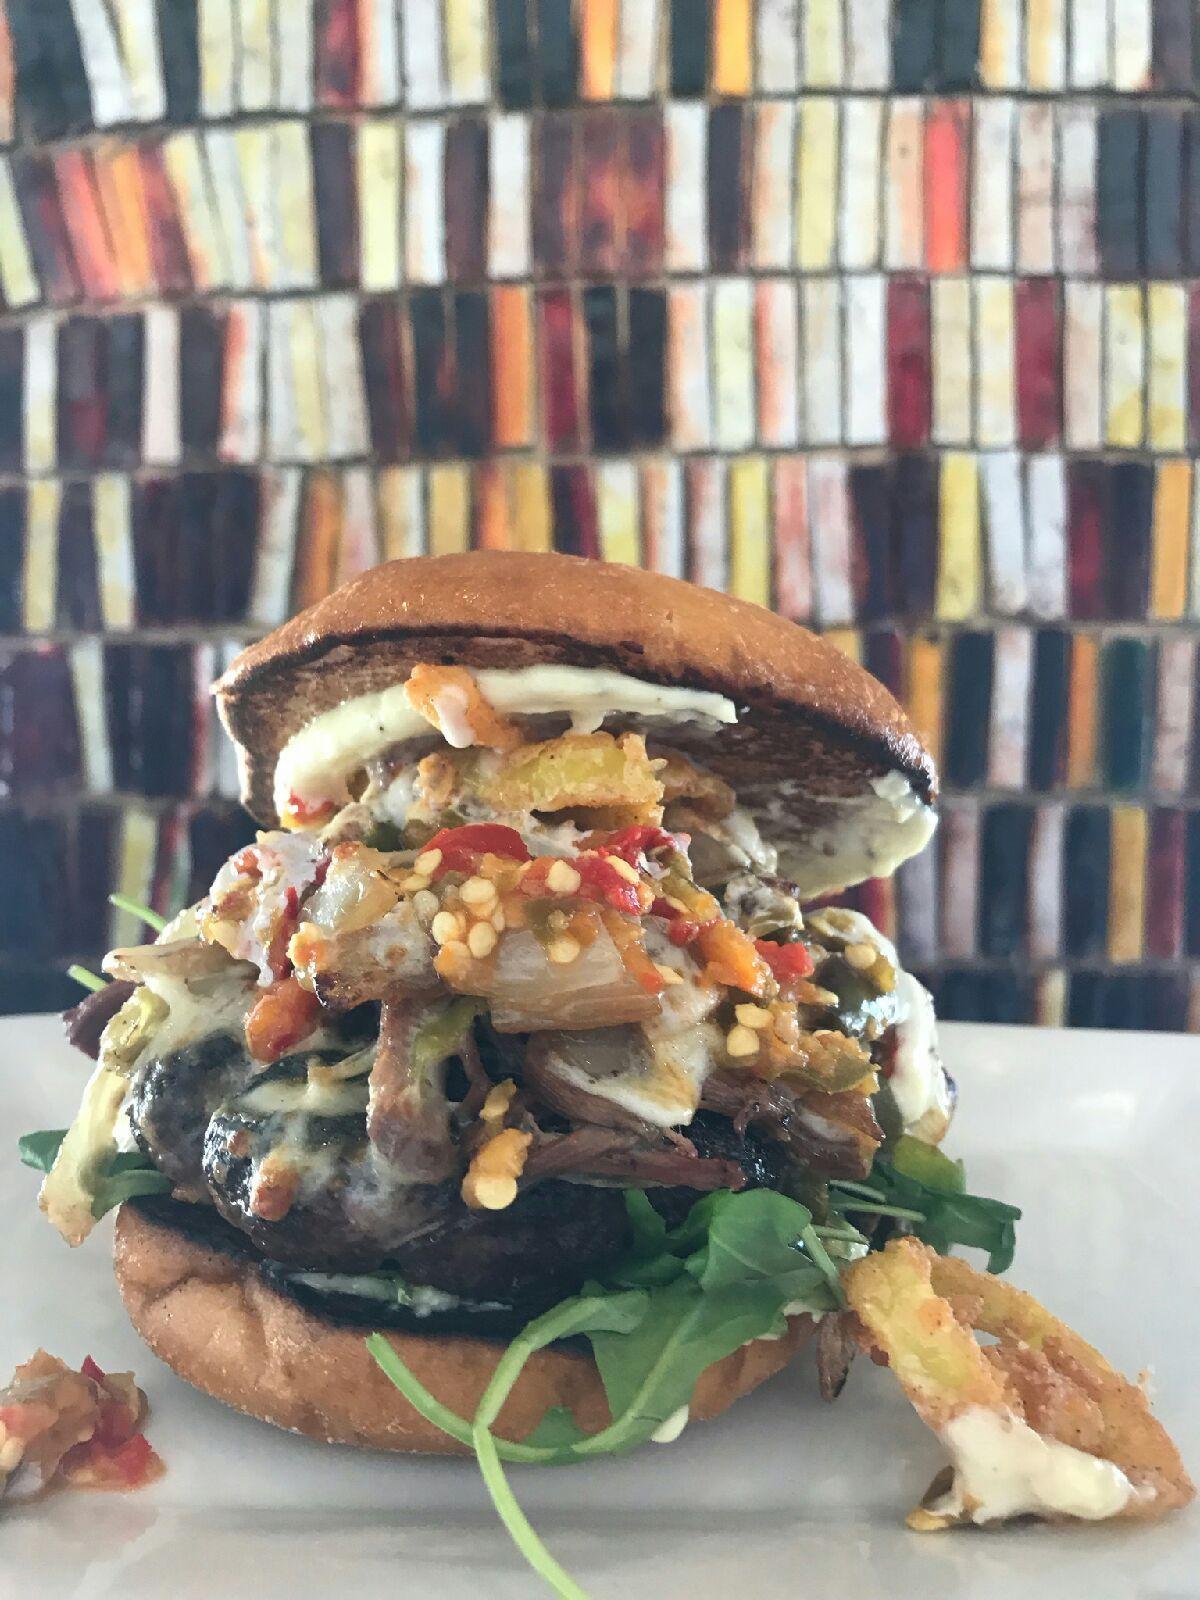 Burger-creations-nellos.jpg